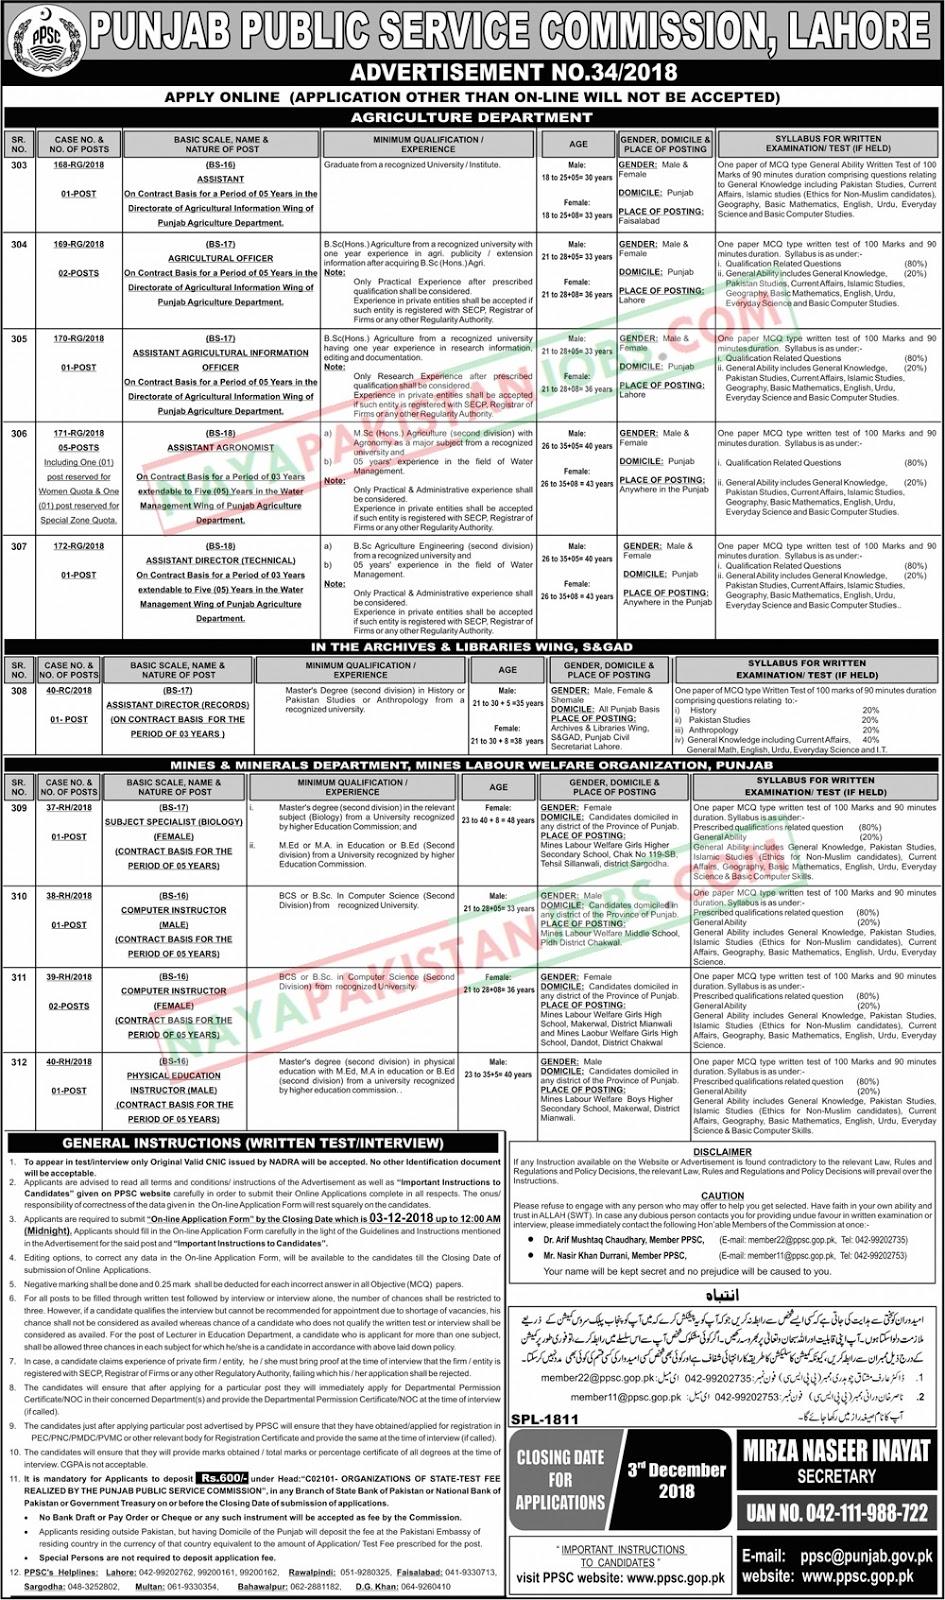 Latest Vacancies Announced in PPSC.GOP.PK Punjab Public Service Commission PPSC 18 November 2018 - Naya Pakistan